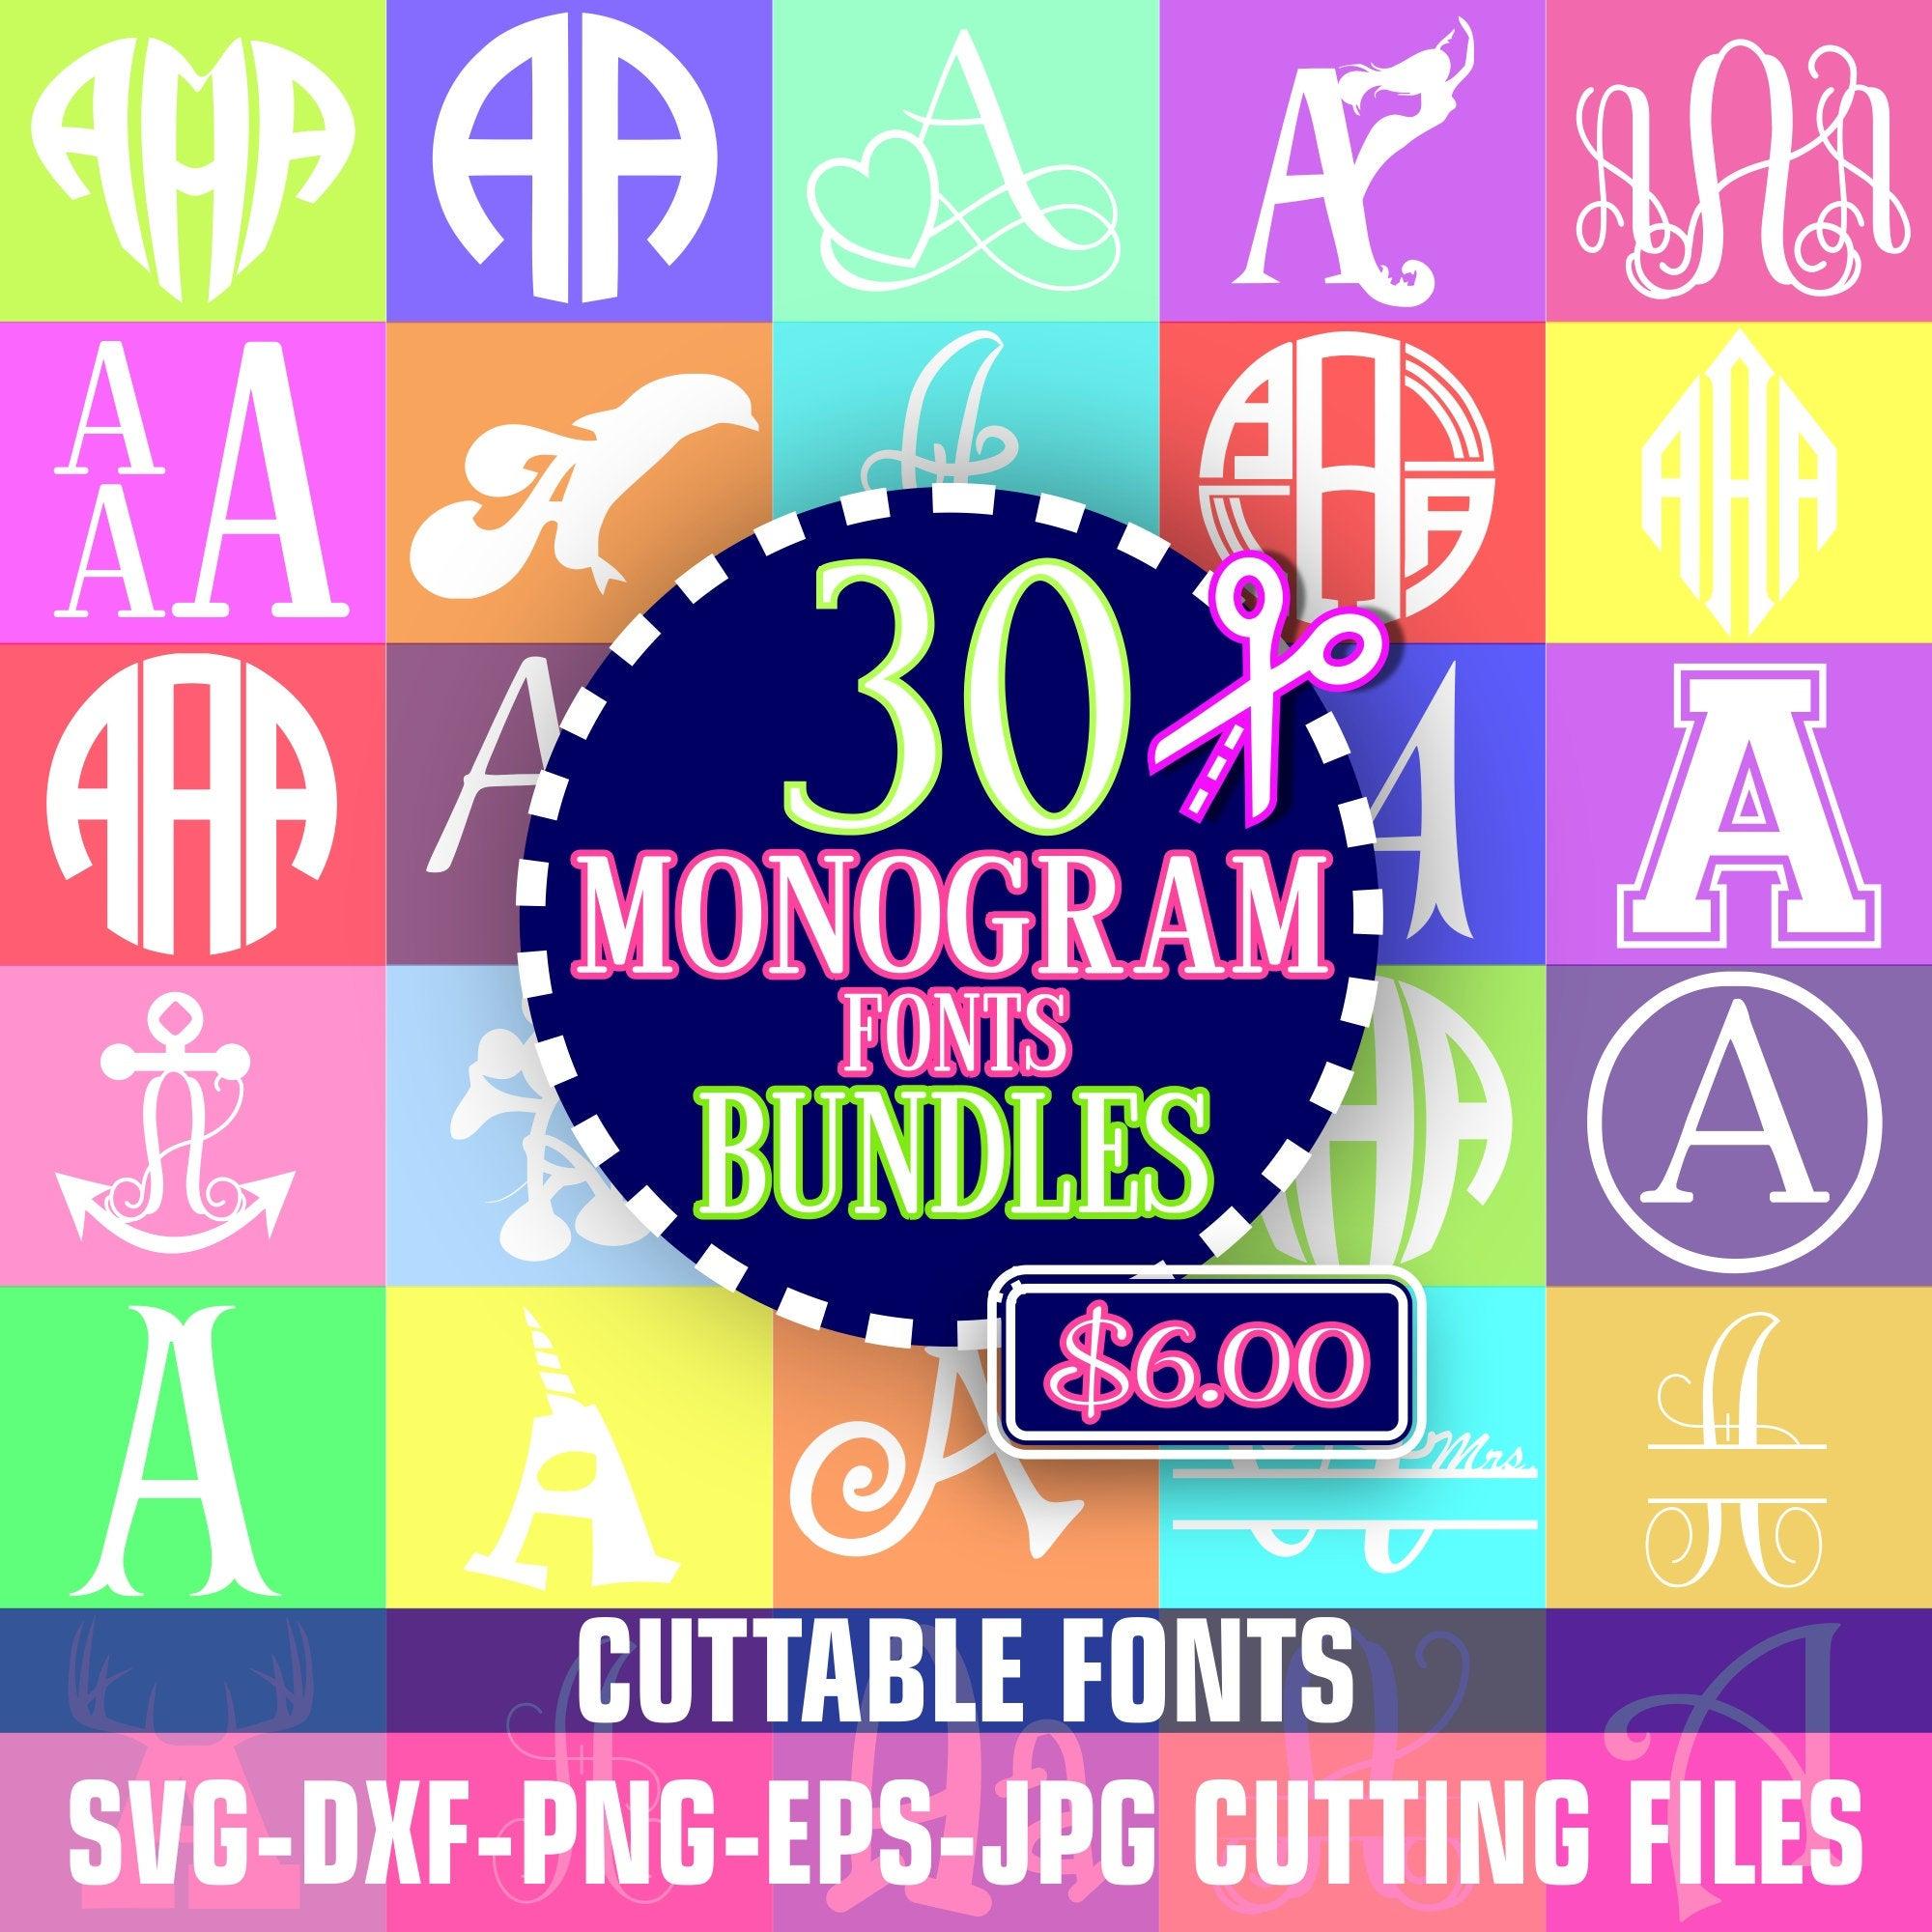 Bundle-svg-font-bundle-cricut-bundle-svg-font-font-bundle-svg-svg-monogram-font-svg-cricut-font-monogram-svg-bundle-svg-for-cricut-5e22621c